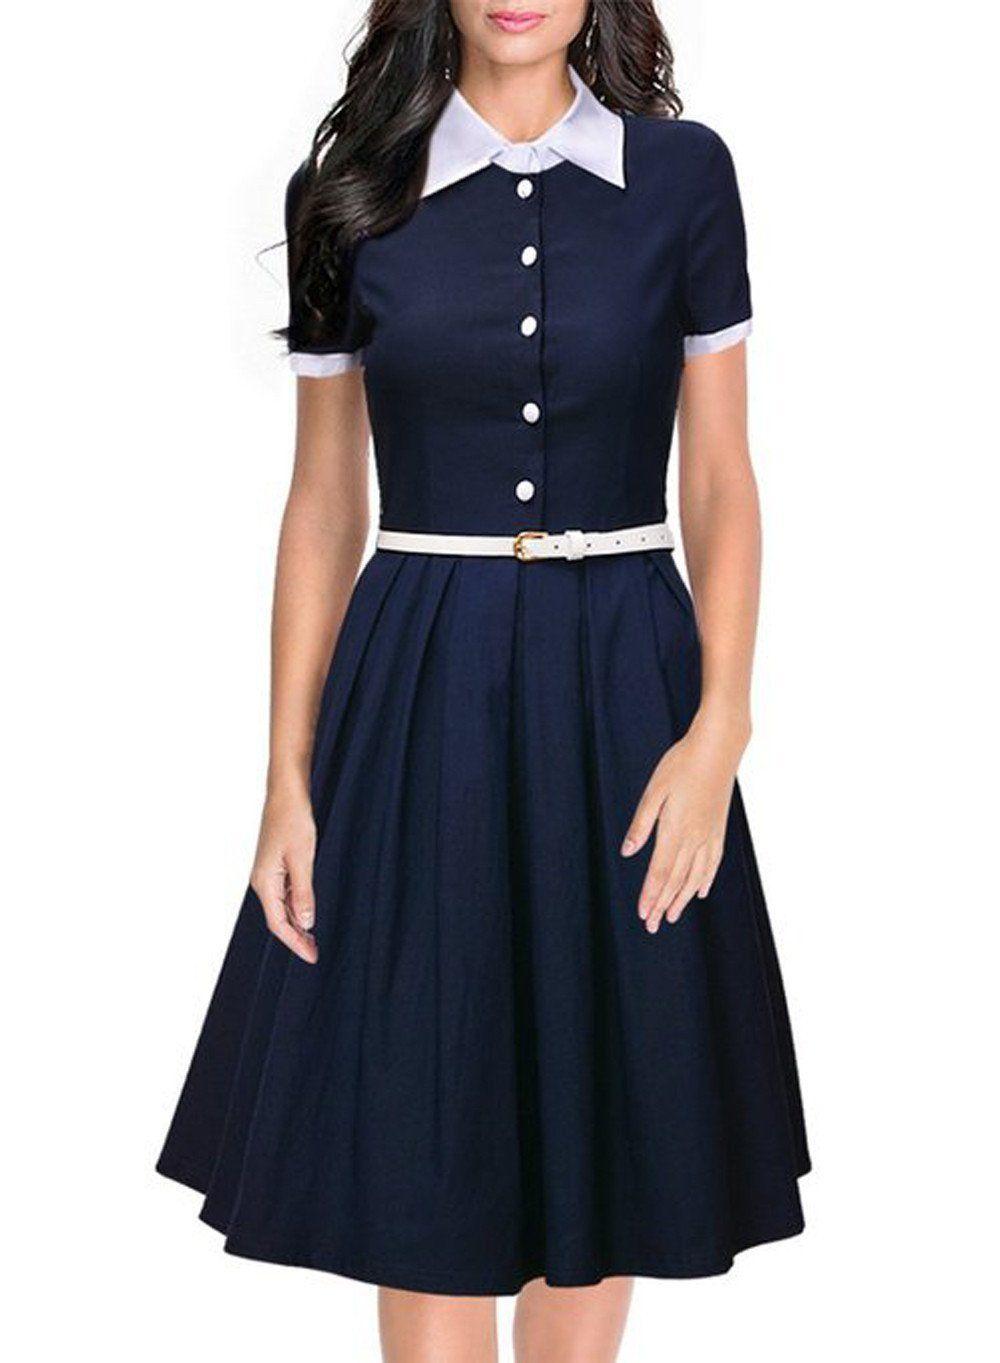 c6e2e9f1a1371 Women Vintage Dress Summer Plus Size Elegant Office Work Dress With ...